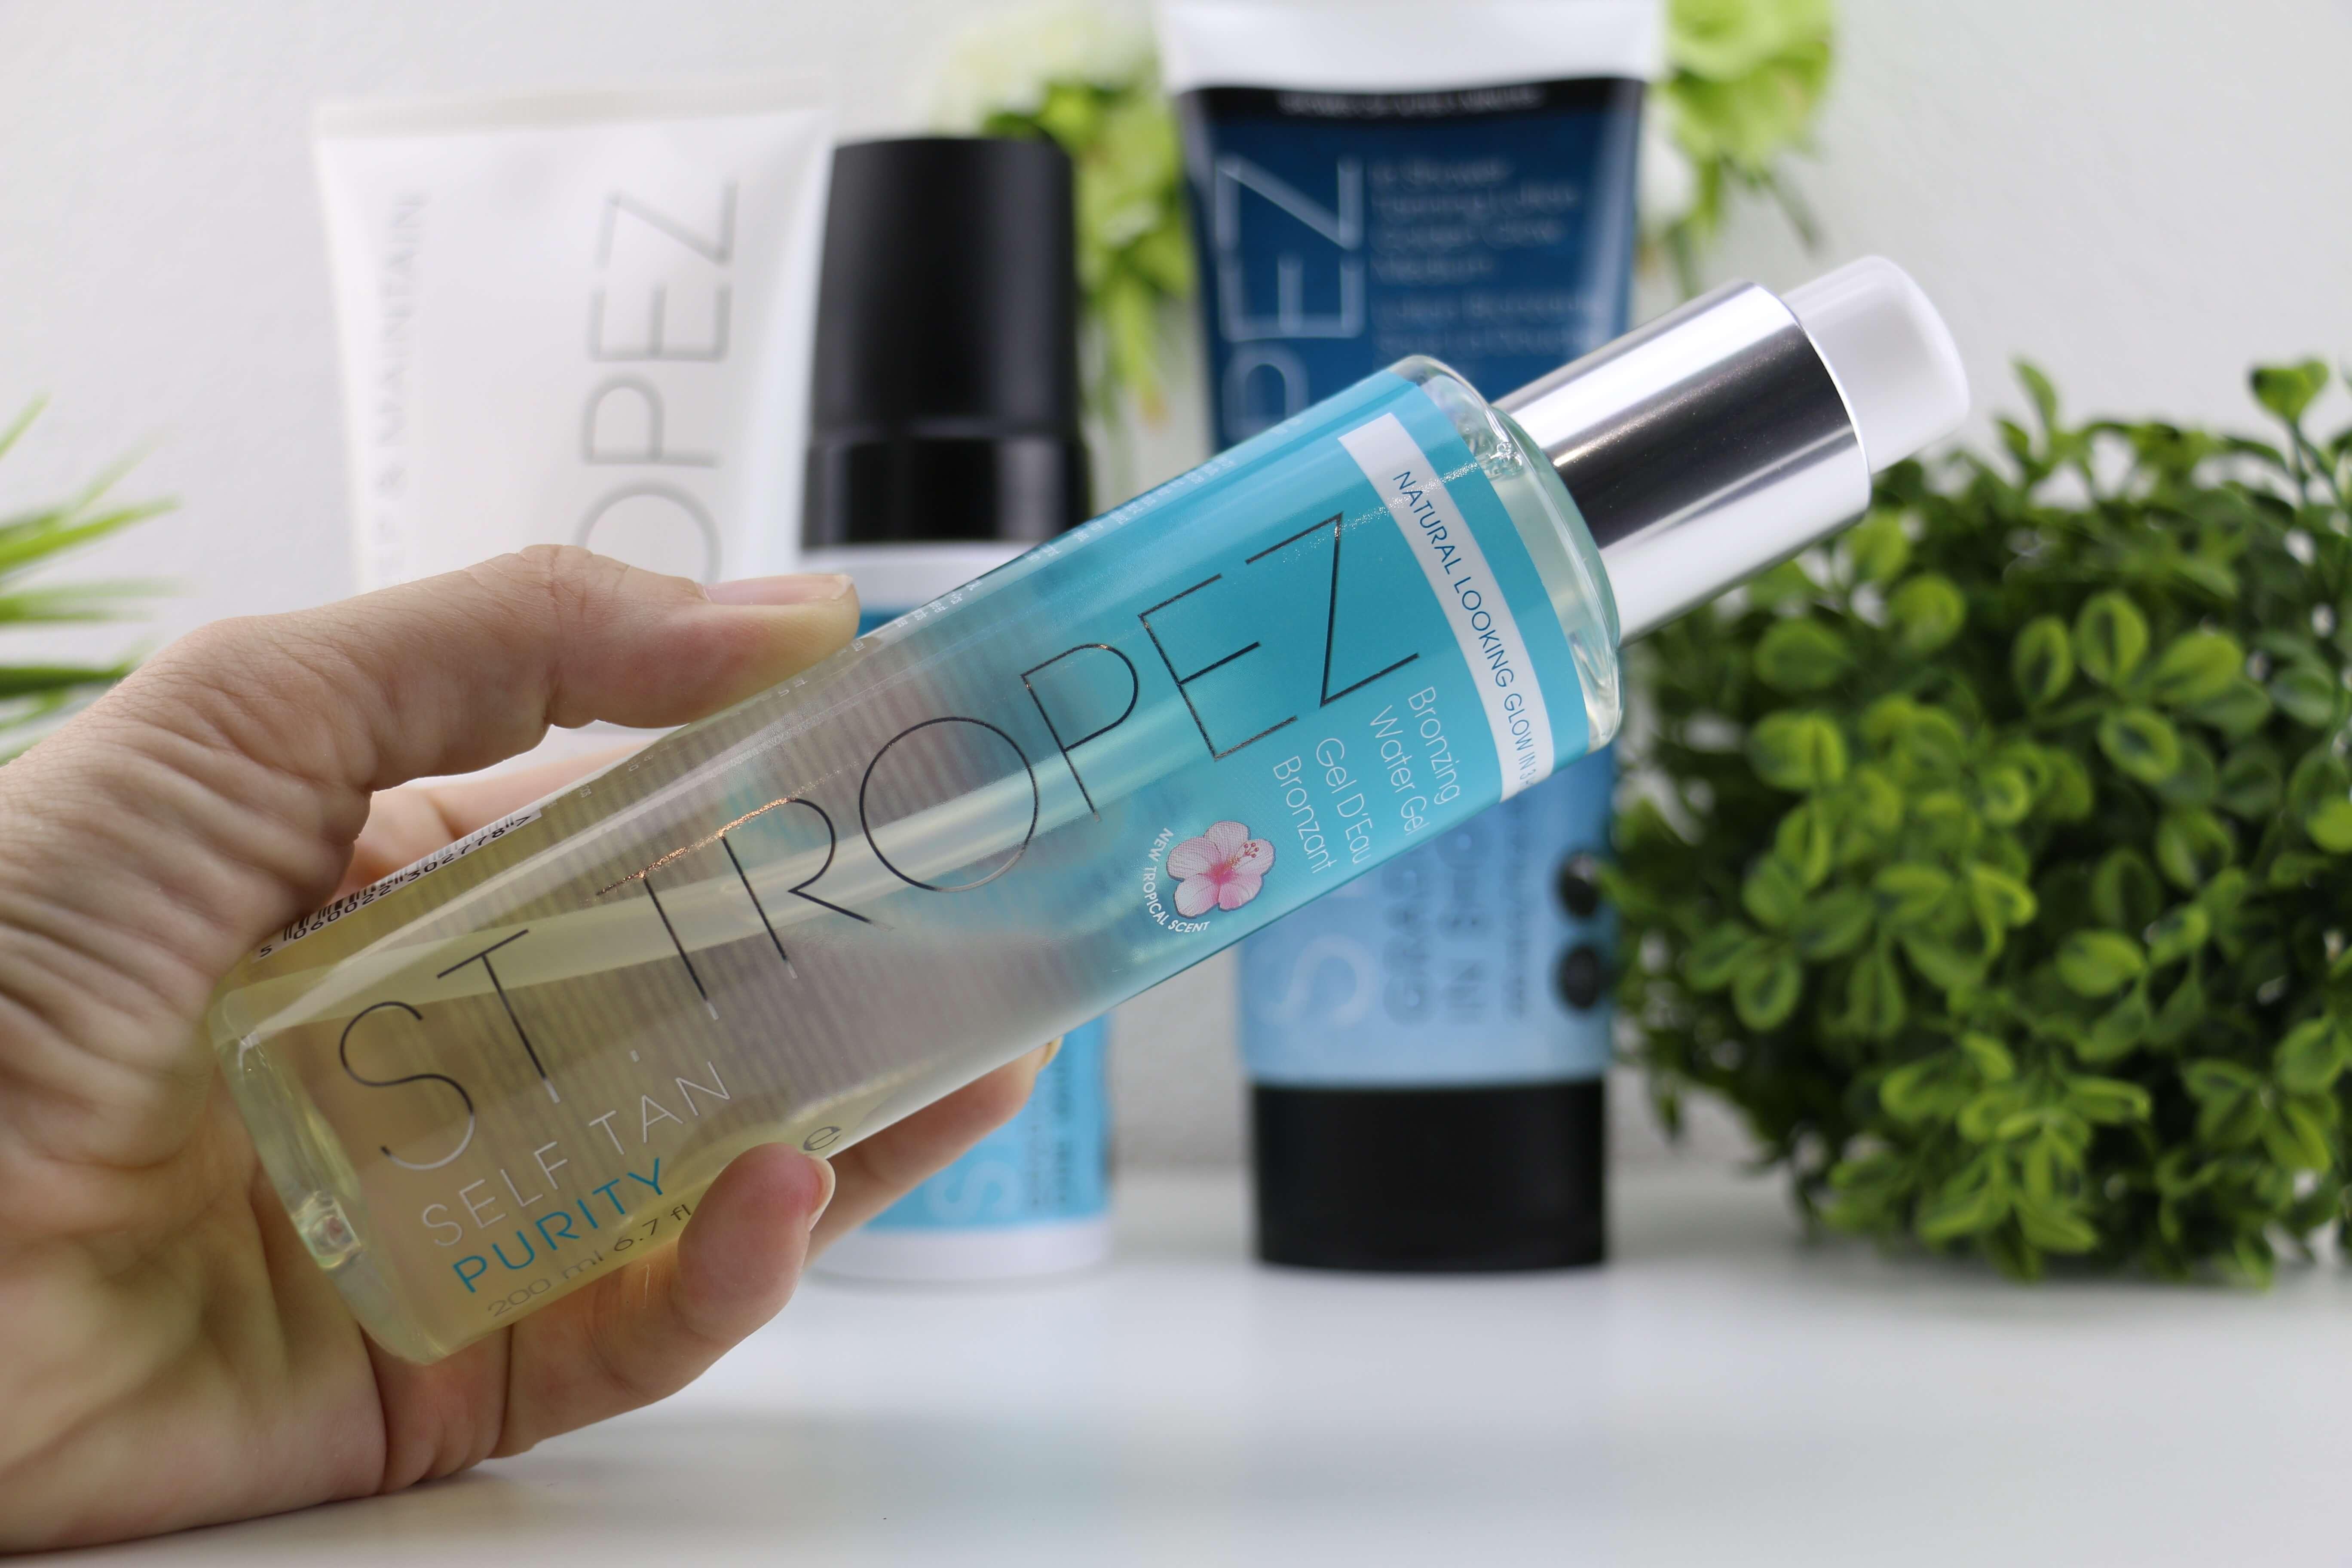 St-Tropez-Purity-Bronzing-Water-Gel